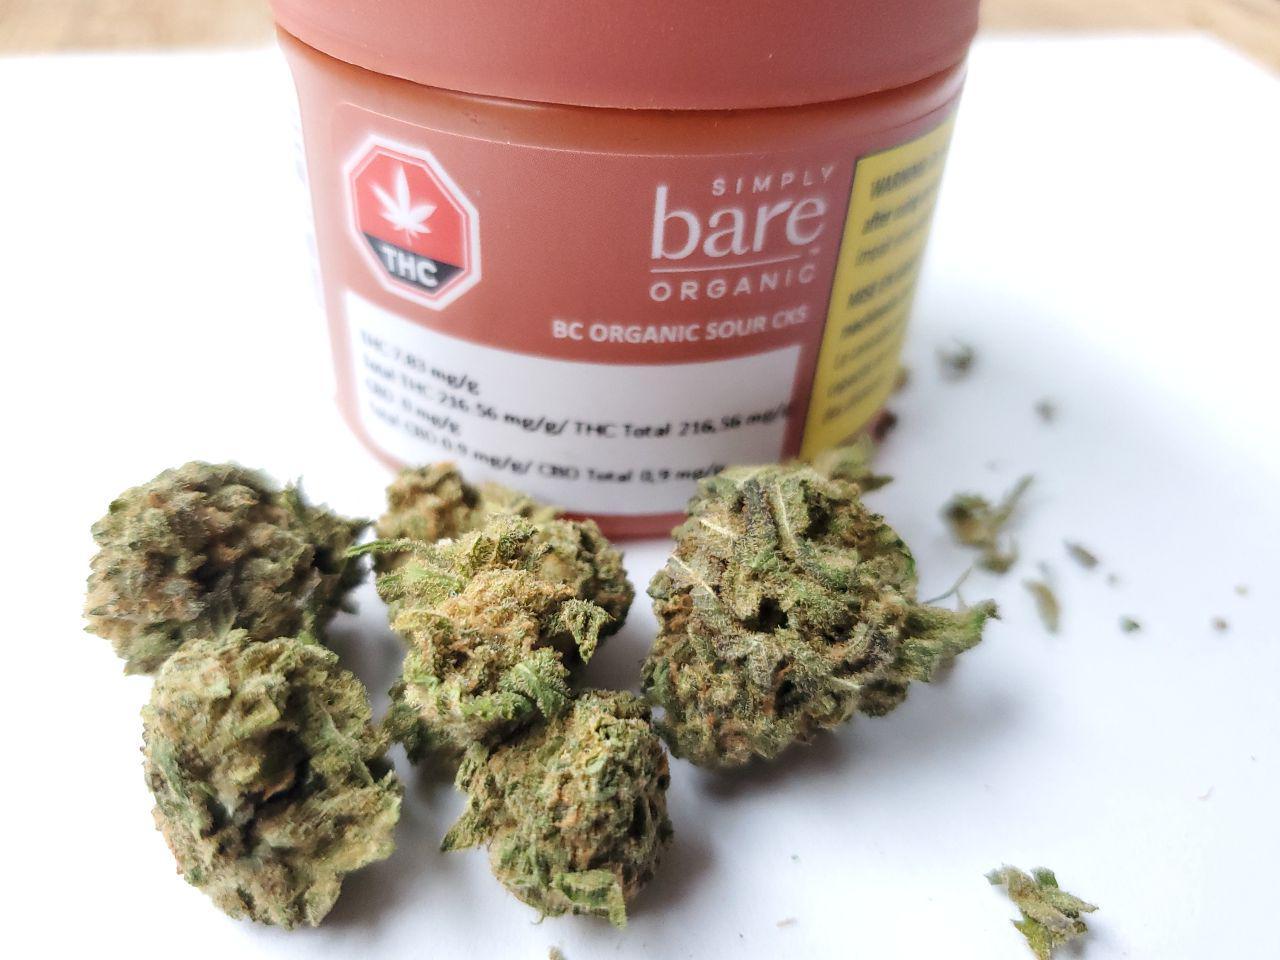 Simply Bare Organic Sour CKS